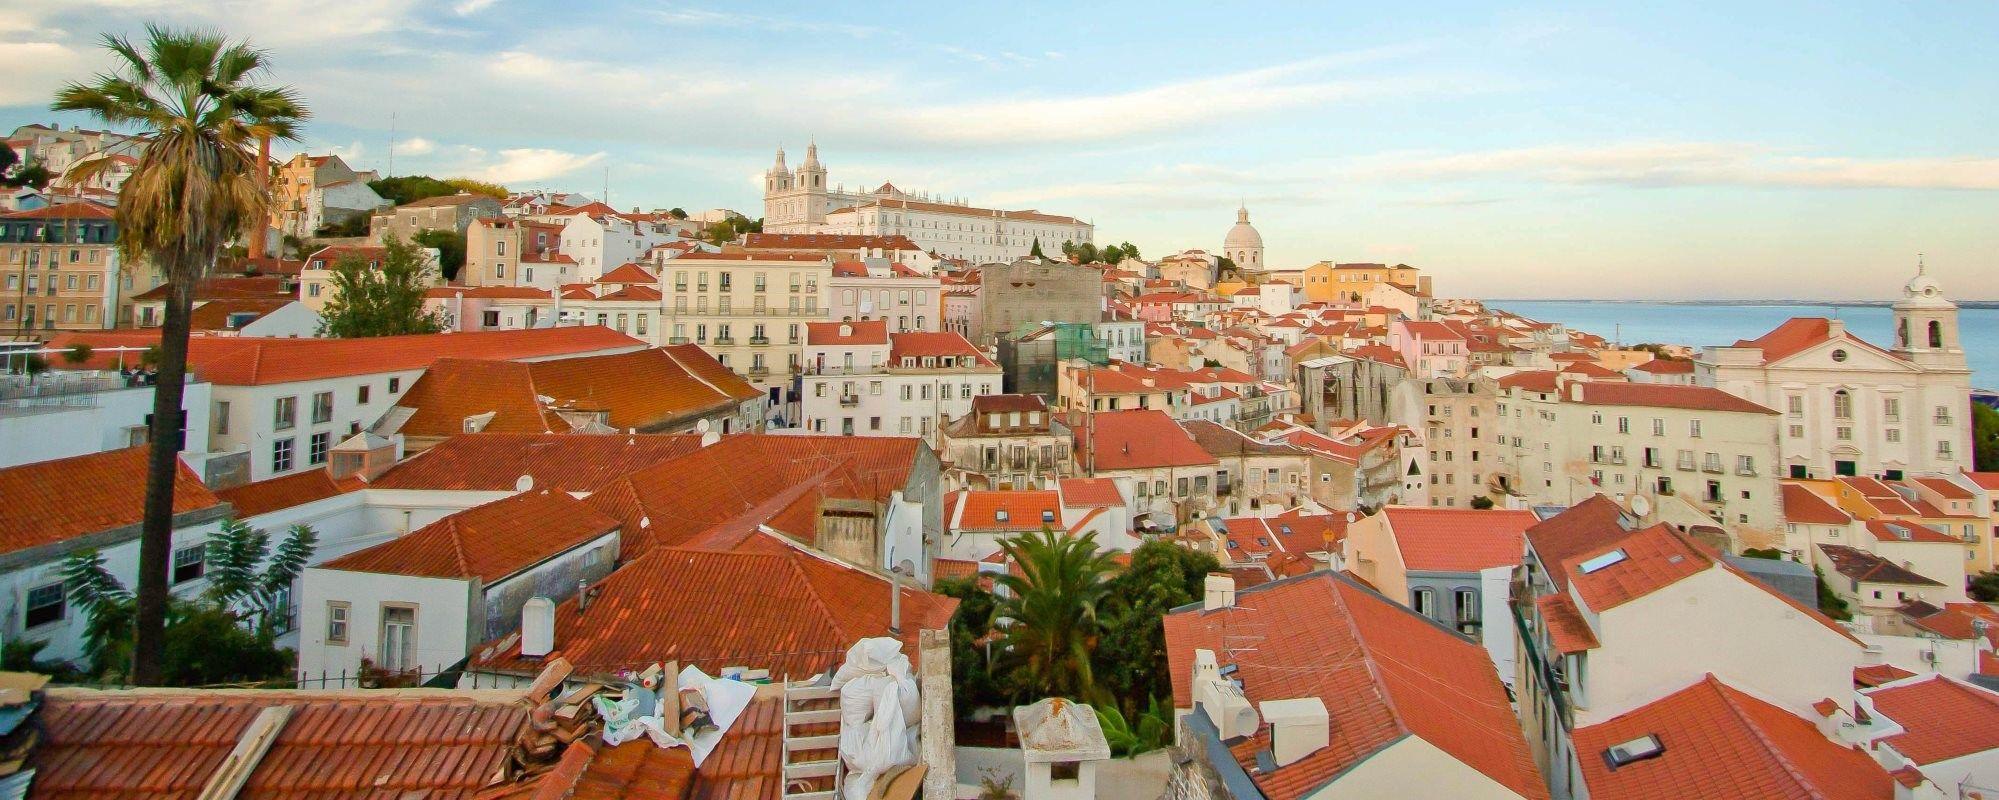 SANDEMANs NEW Lisbon Tours FREE Walking Tours of Lisbon